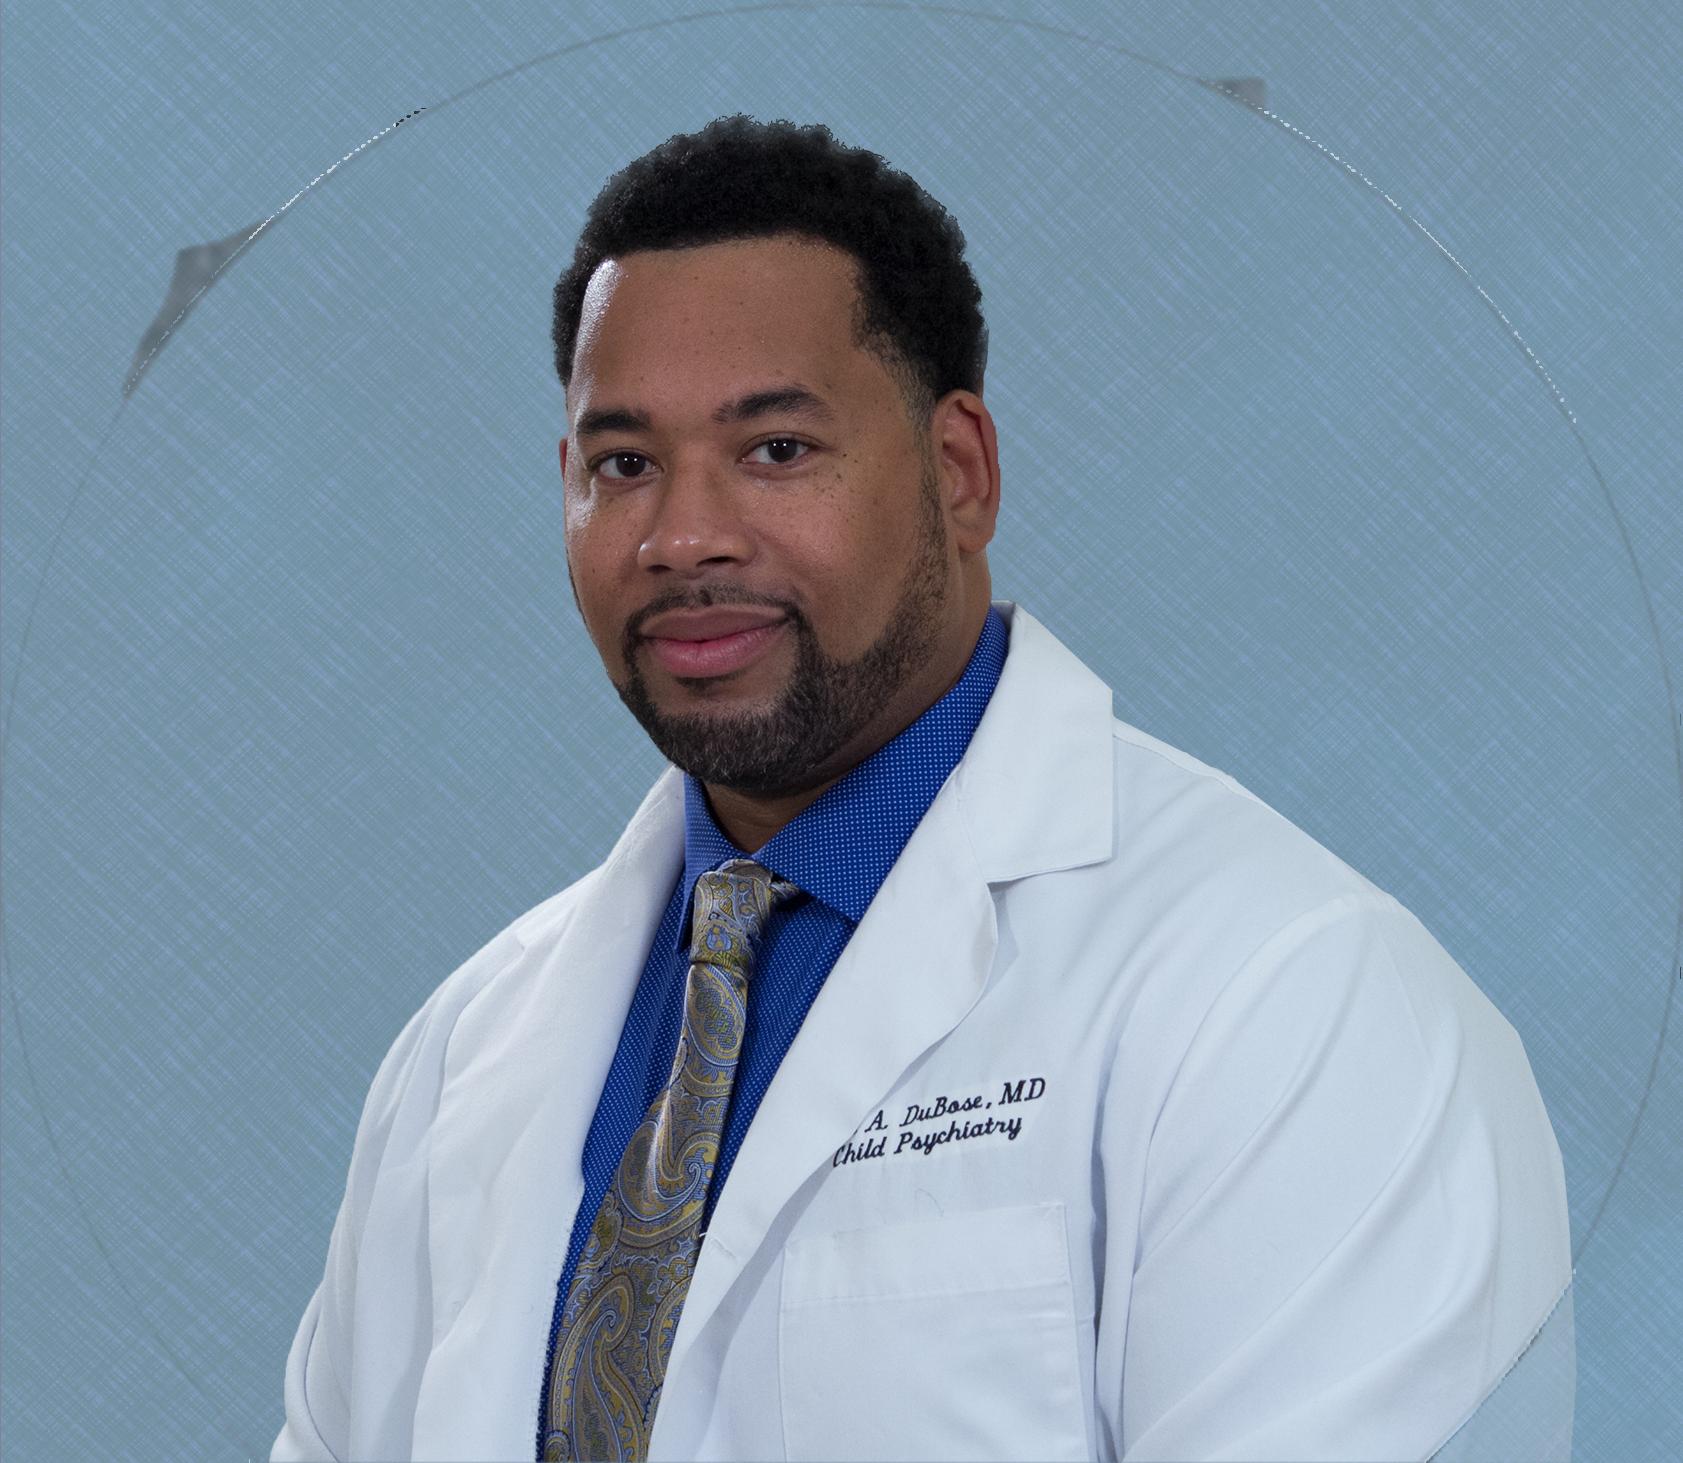 Dr. Don DuBose, MS, MS